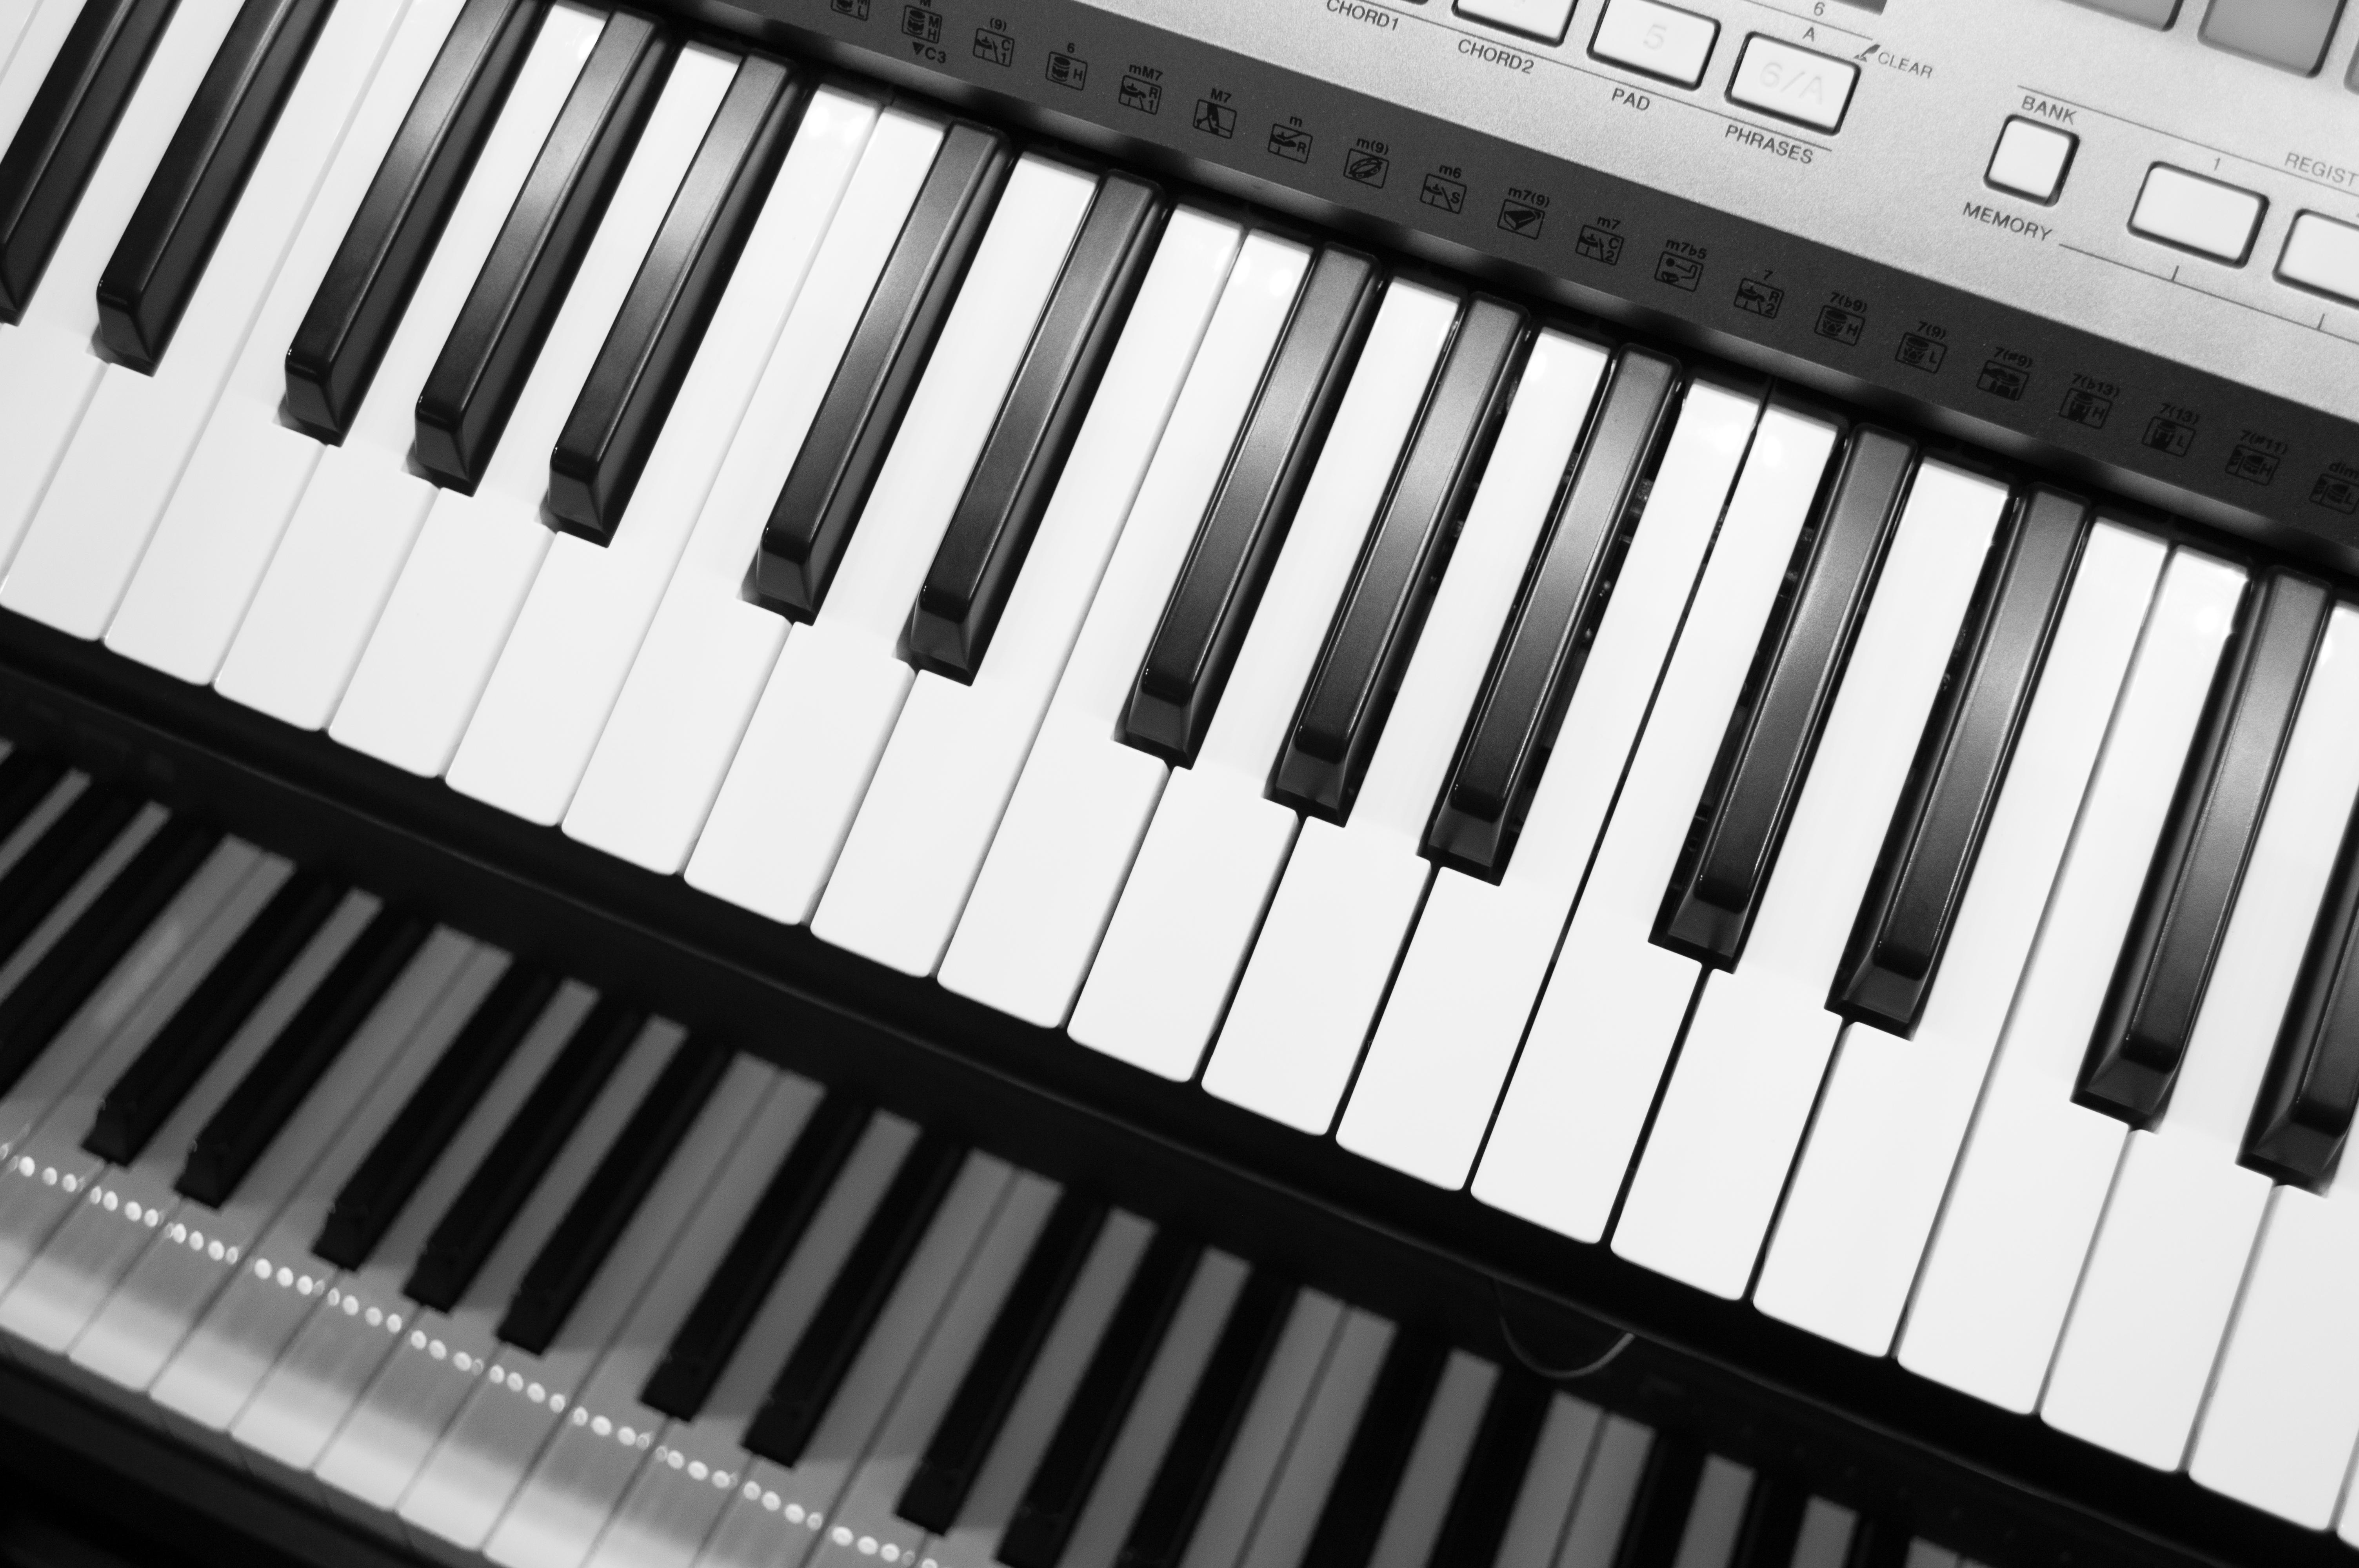 Gambar Hitam Dan Putih Keyboard Teknologi Satu Warna Alat Musik Kunci Kunci Catatan Fotografi Monokrom Instrumen String Piano Digital Peralatan Elektronik Keyboard Musik Alat Elektronik Piano Listrik Keyboard Elektronik Synthesizer